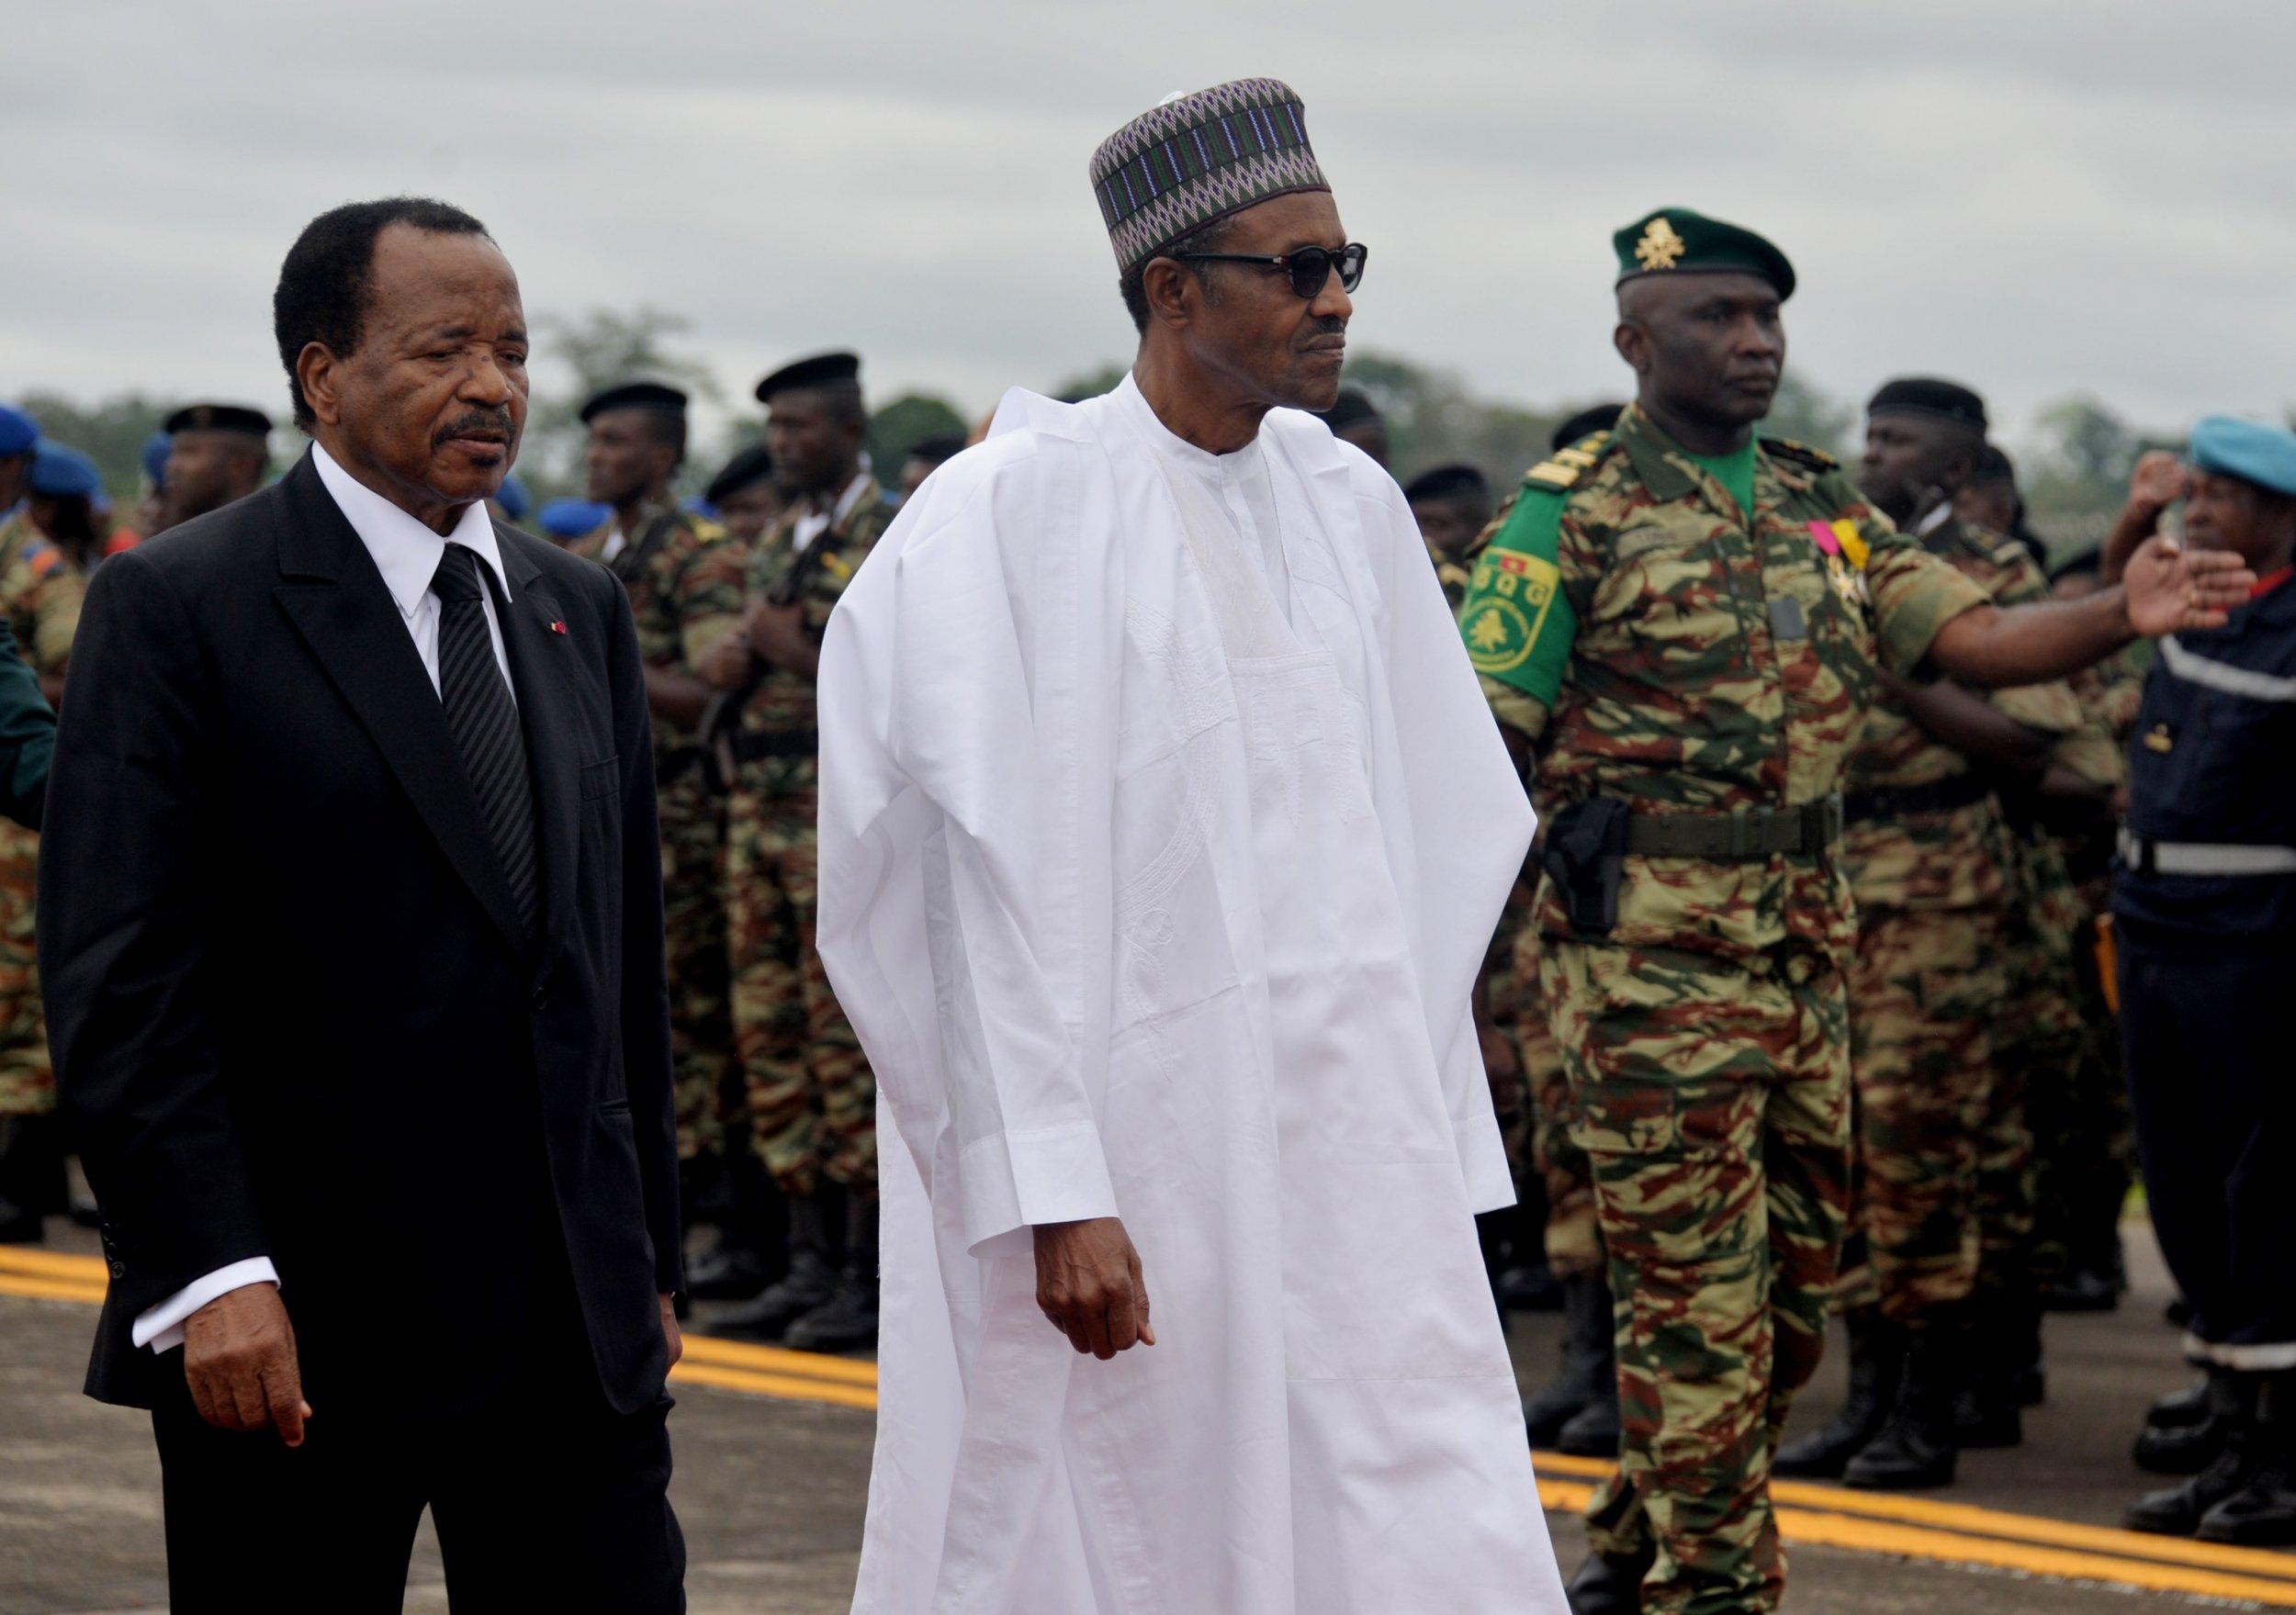 Cameroonian President Paul Biya walks with Nigerian President Muhammadu Buhari.